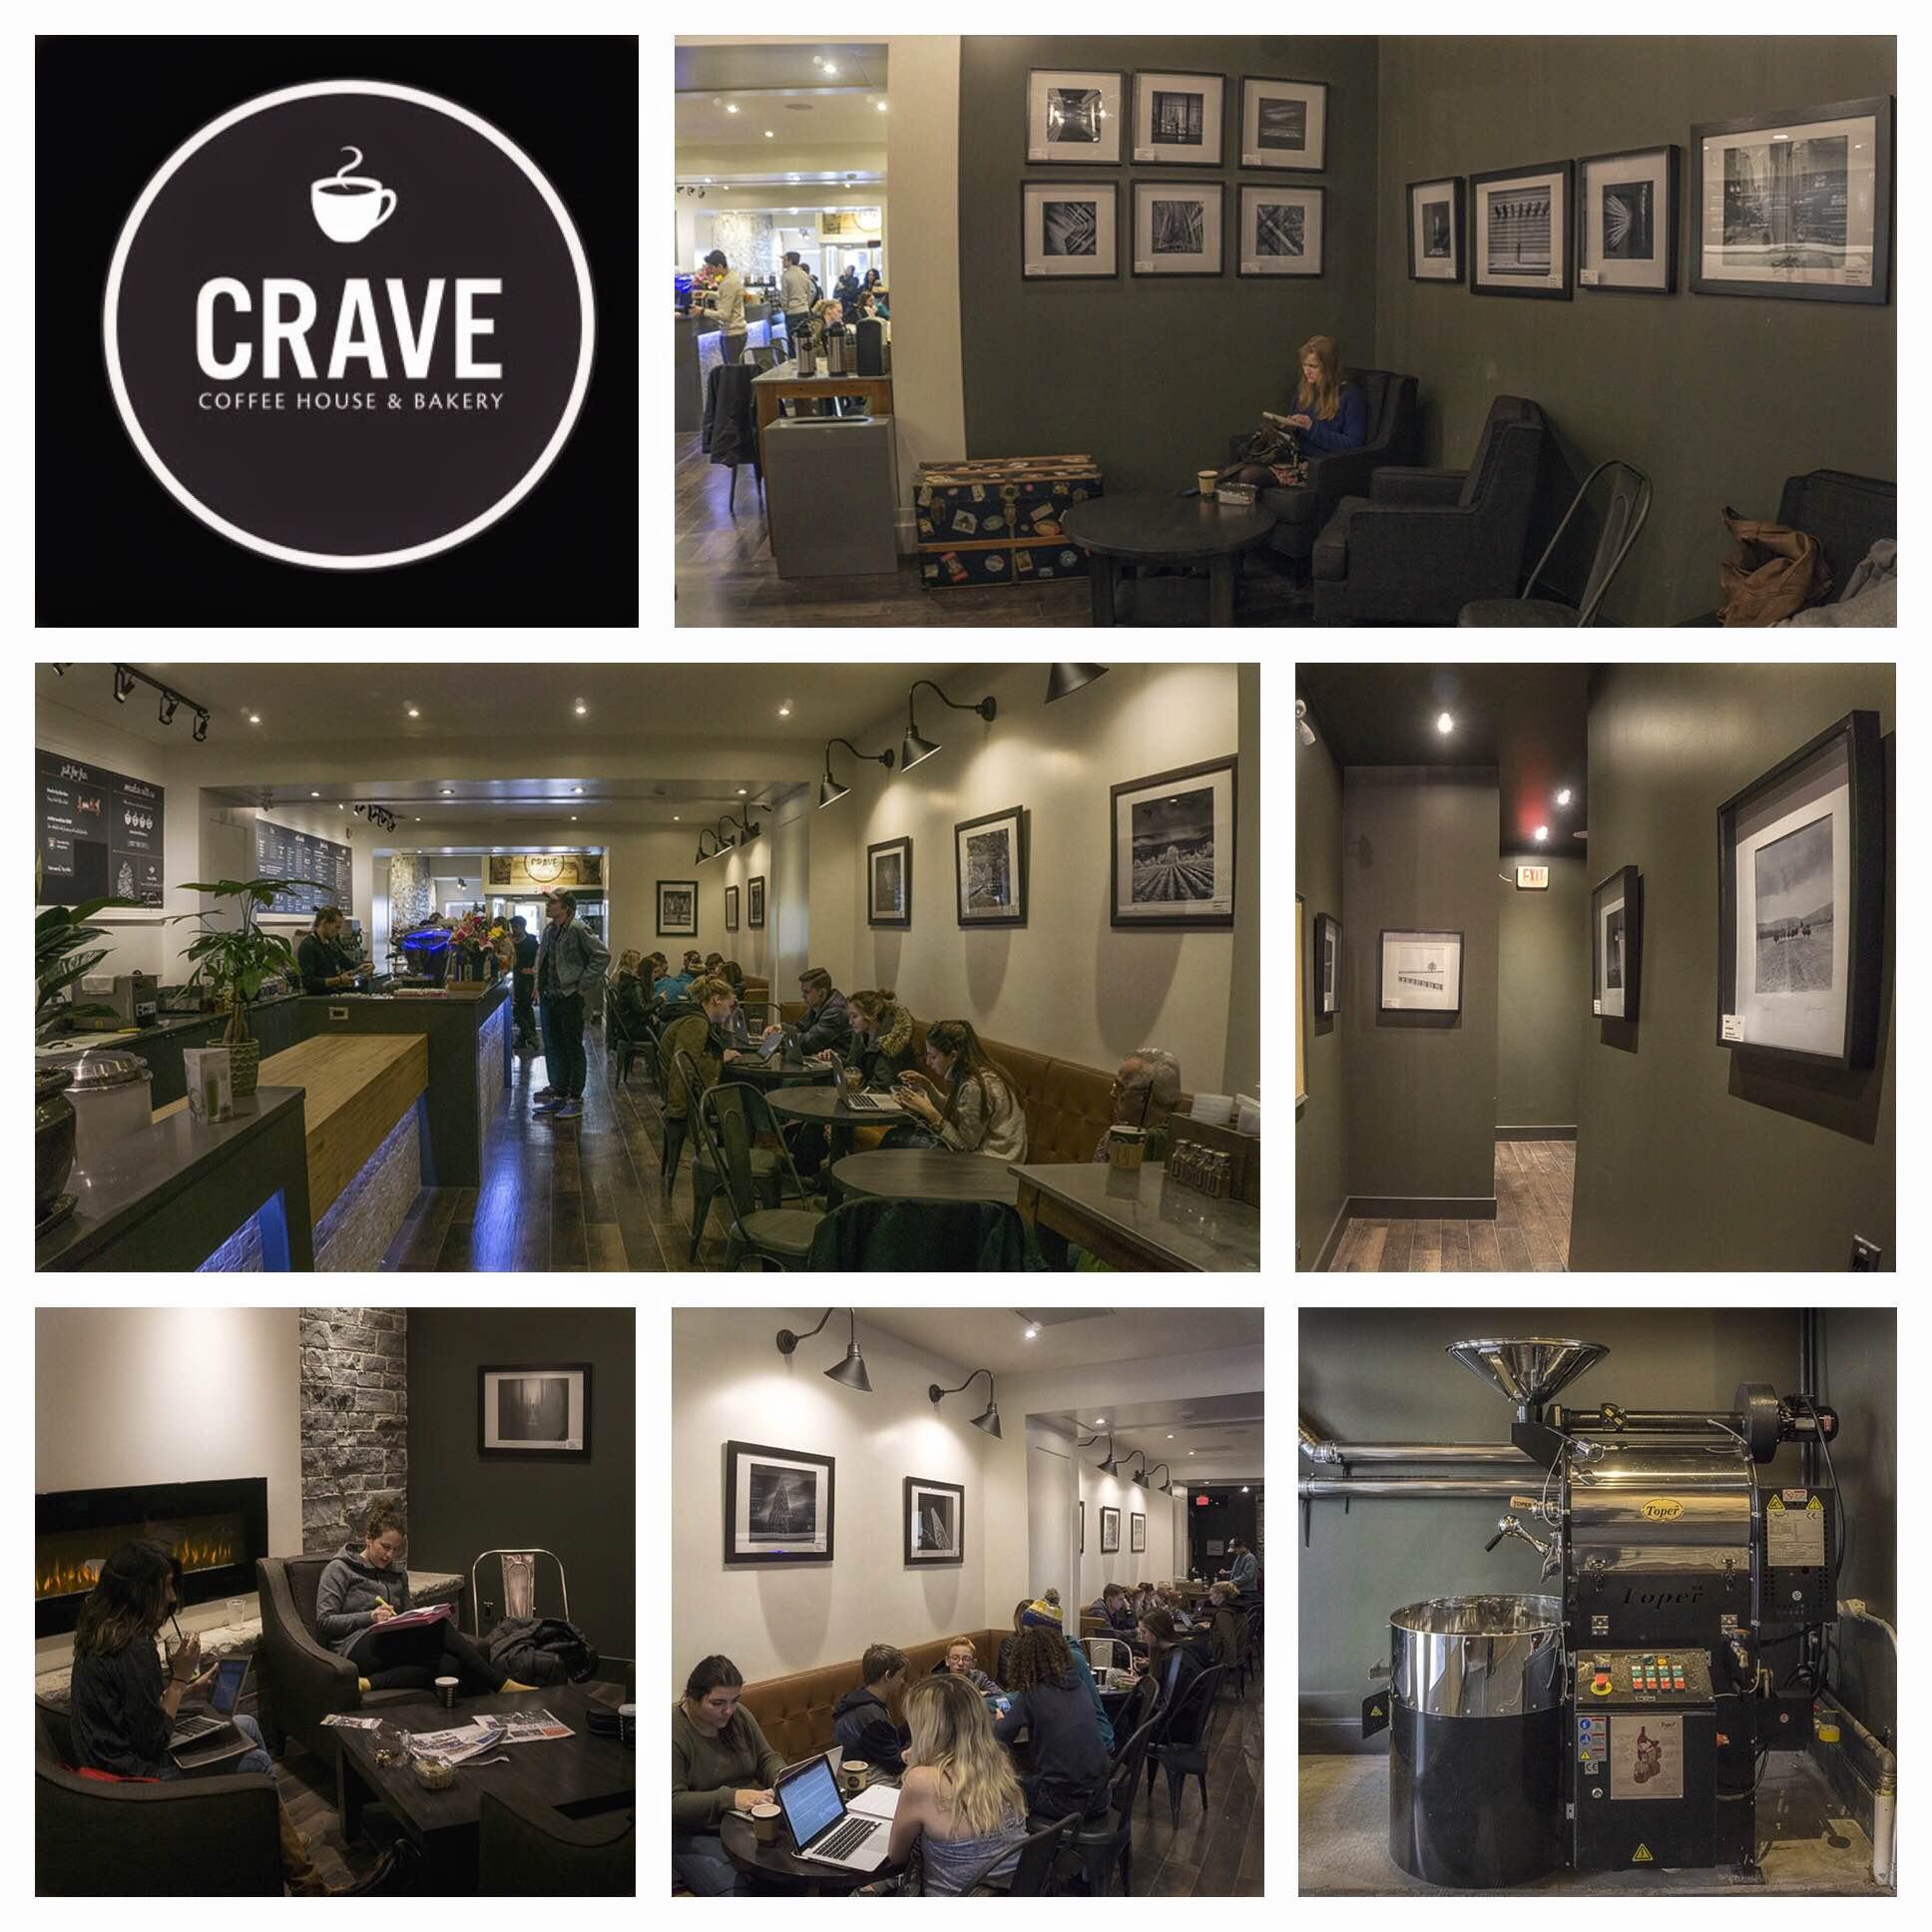 crave-coffee-my-photos-szp